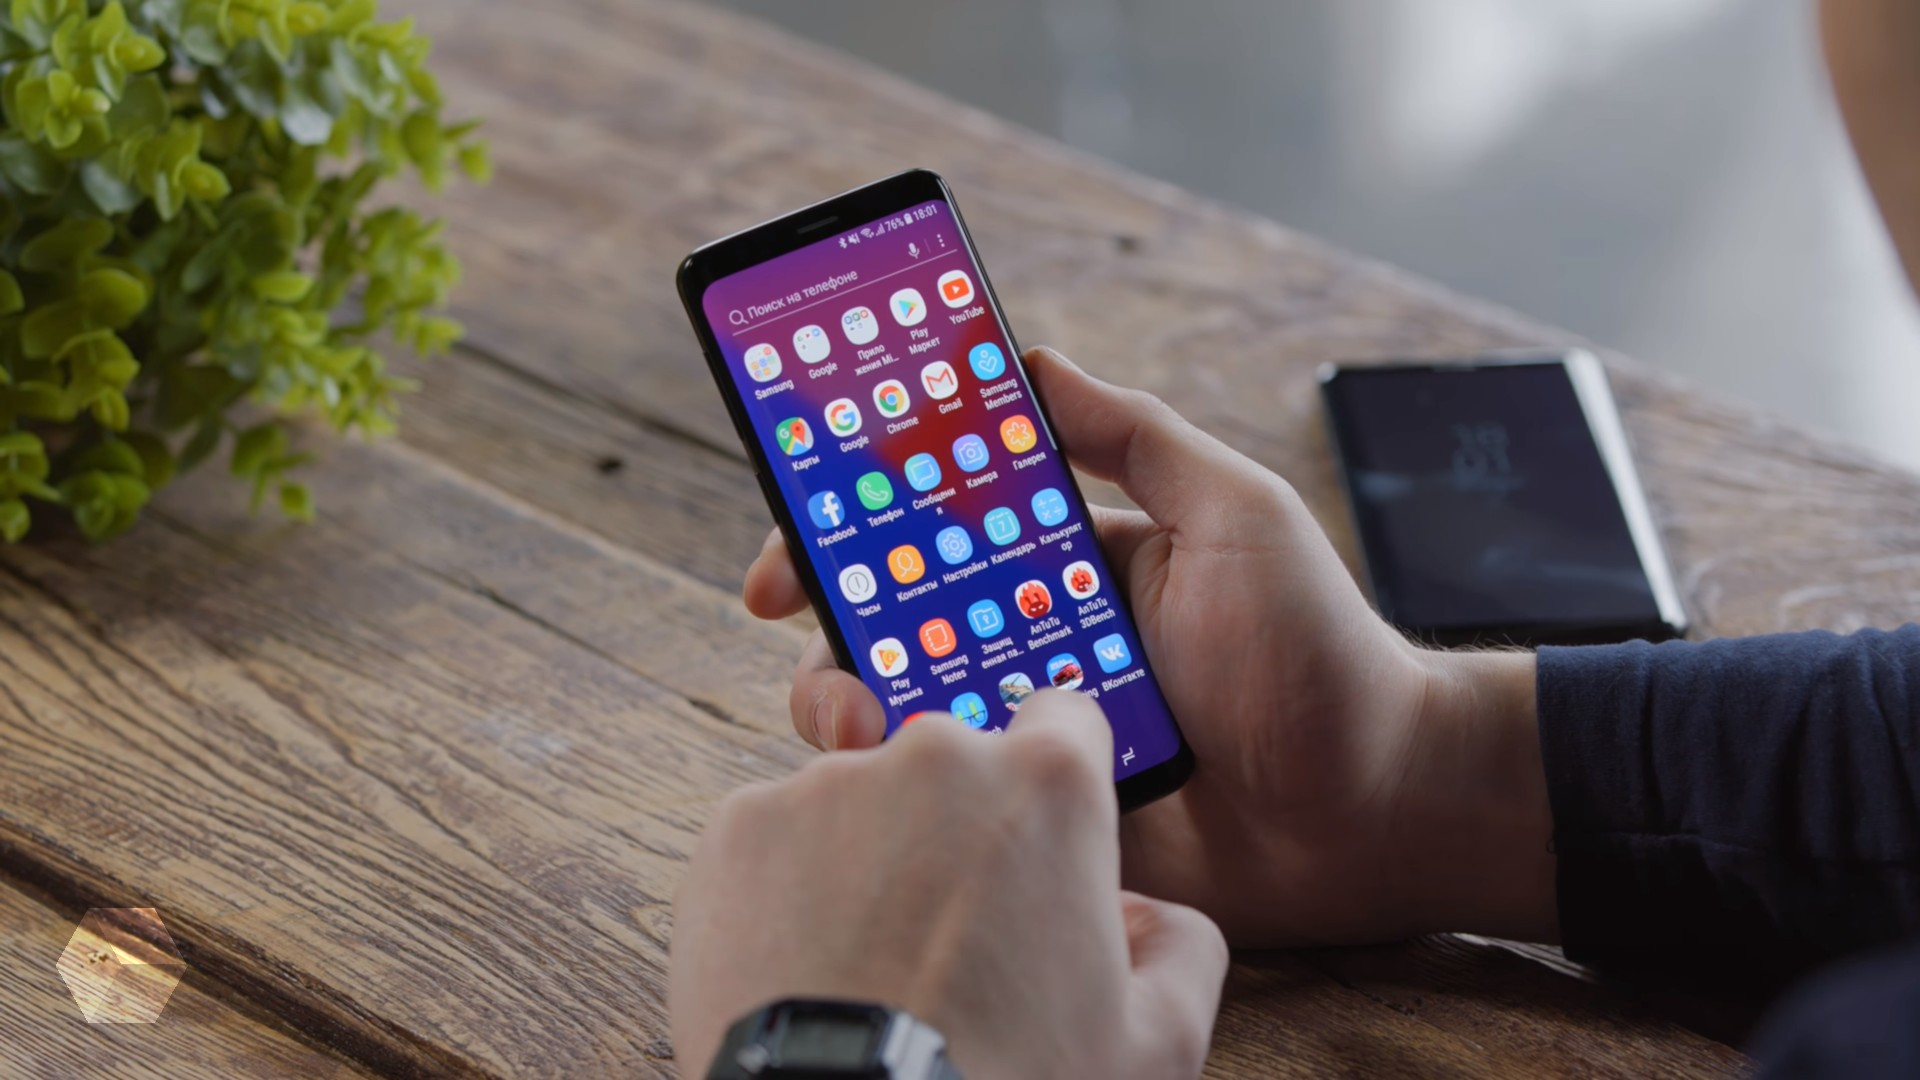 Samsung Galaxy S9, S9+ и Note 9 получат Android Pie в январе